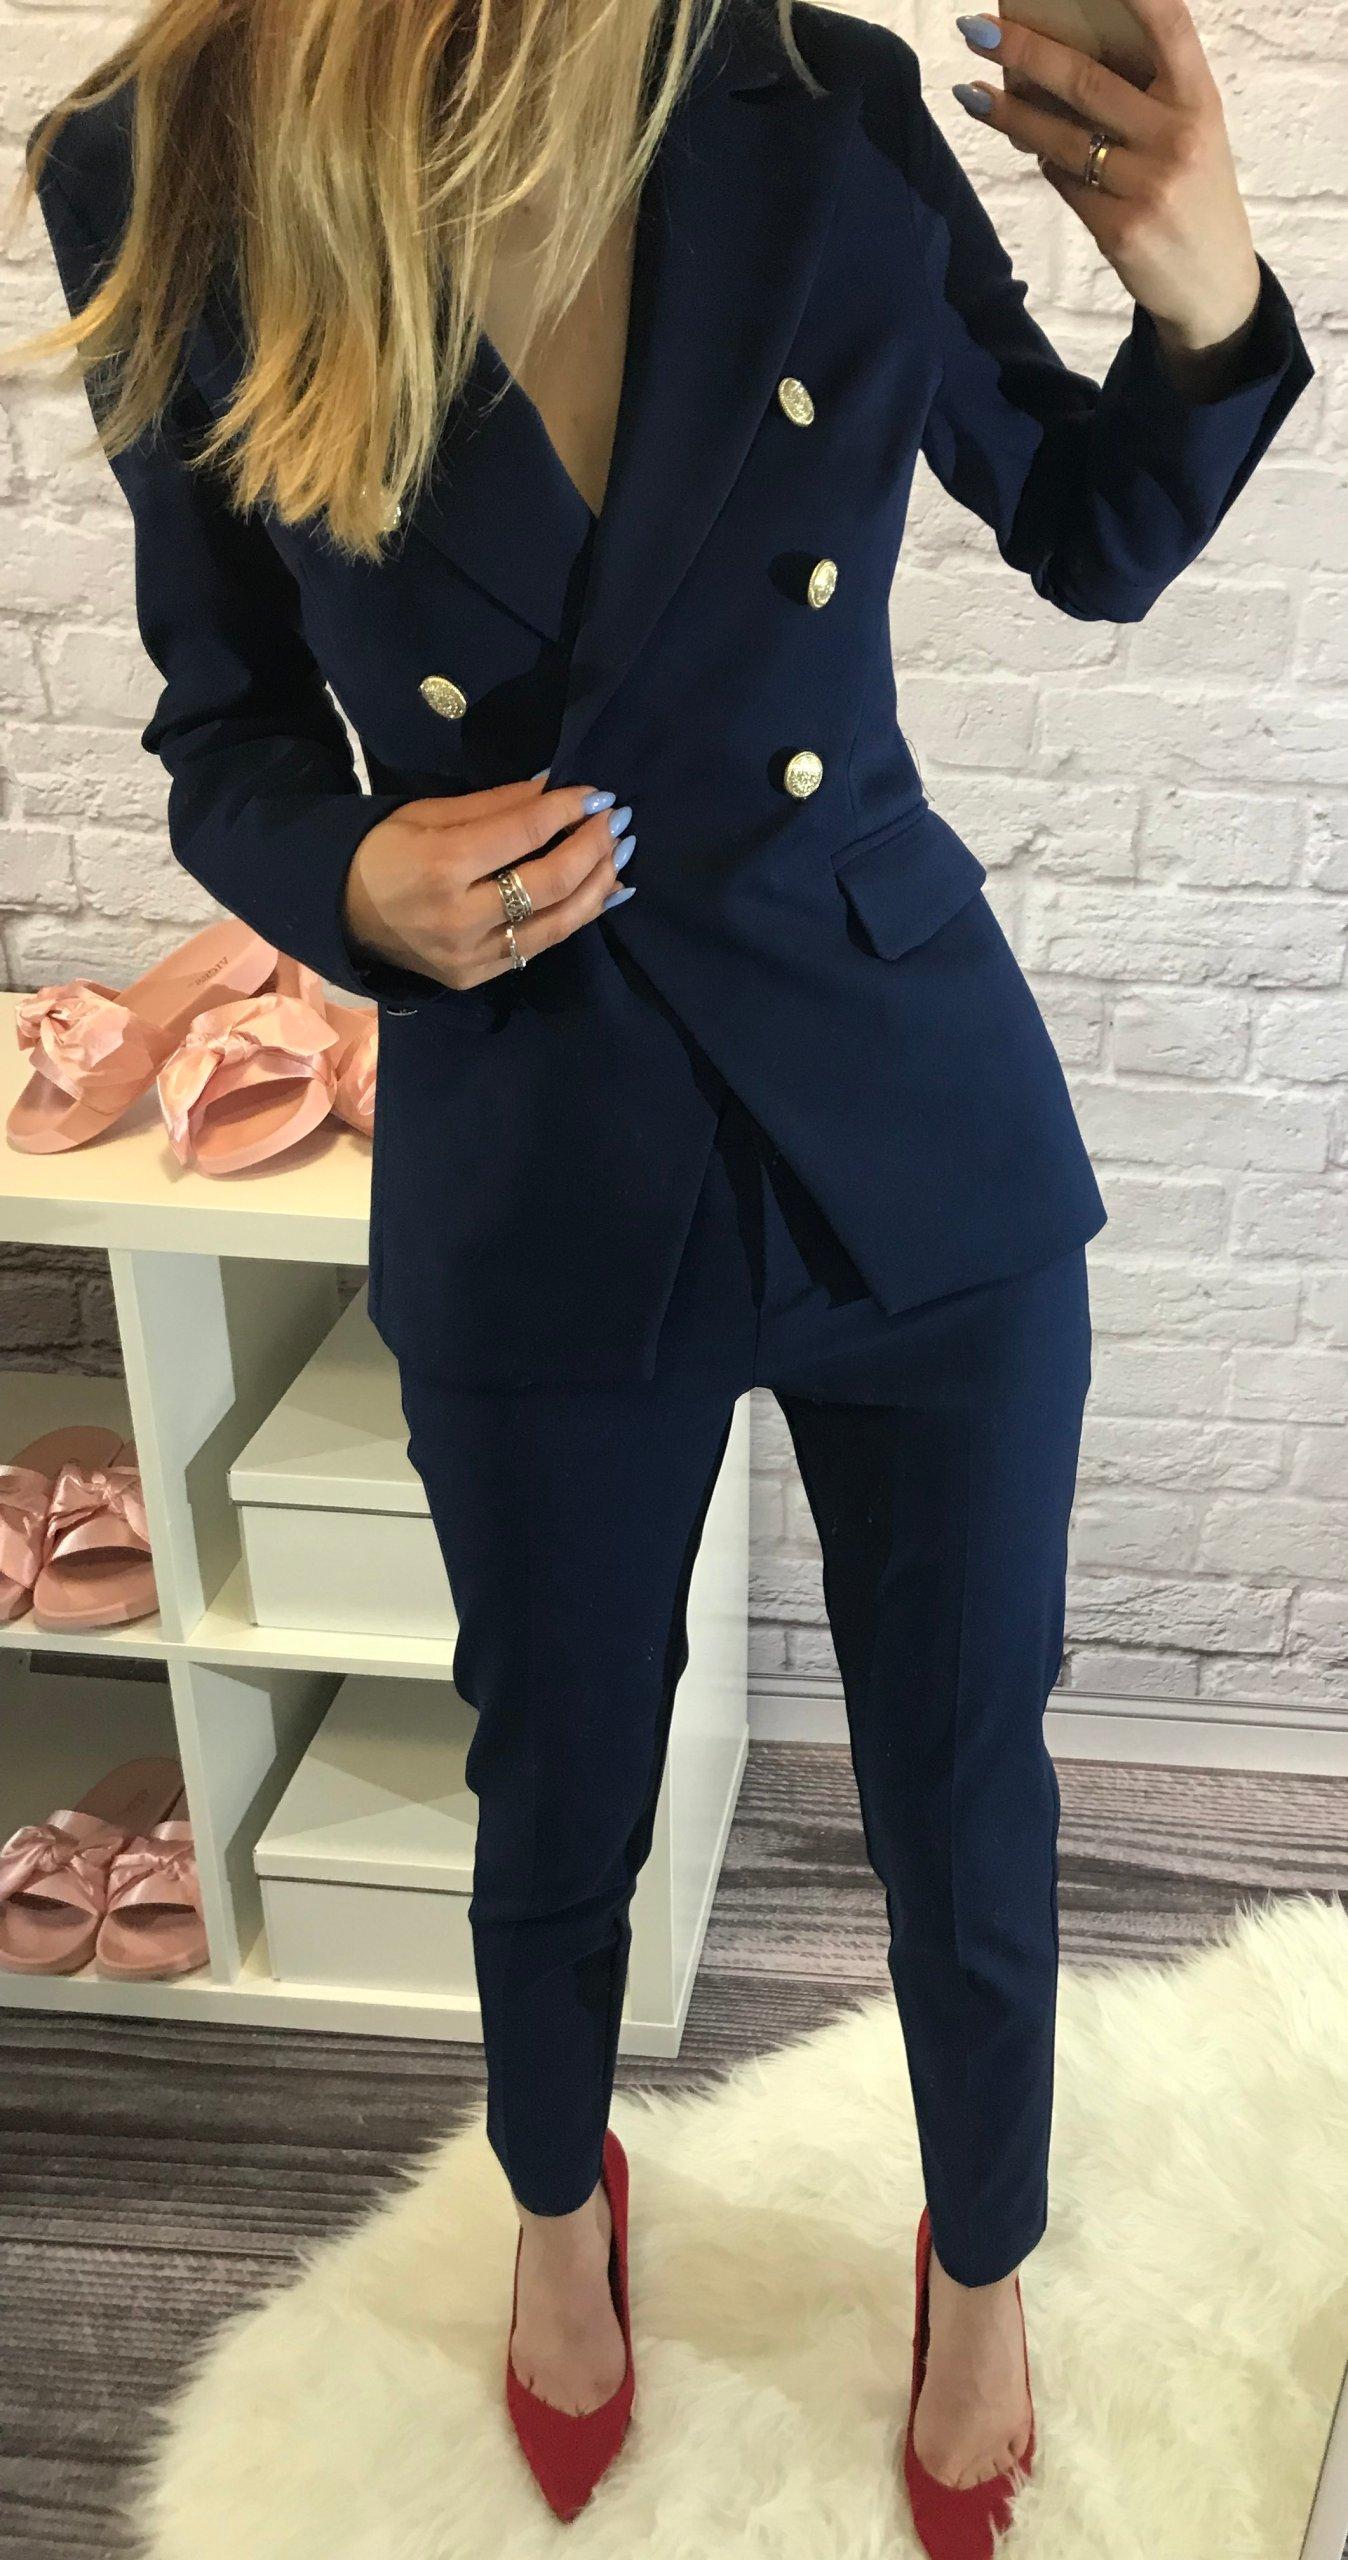 9f72c69e19 GARNITUR damski komplet MARYNARKA spodnie XL 42 - 7286251812 ...